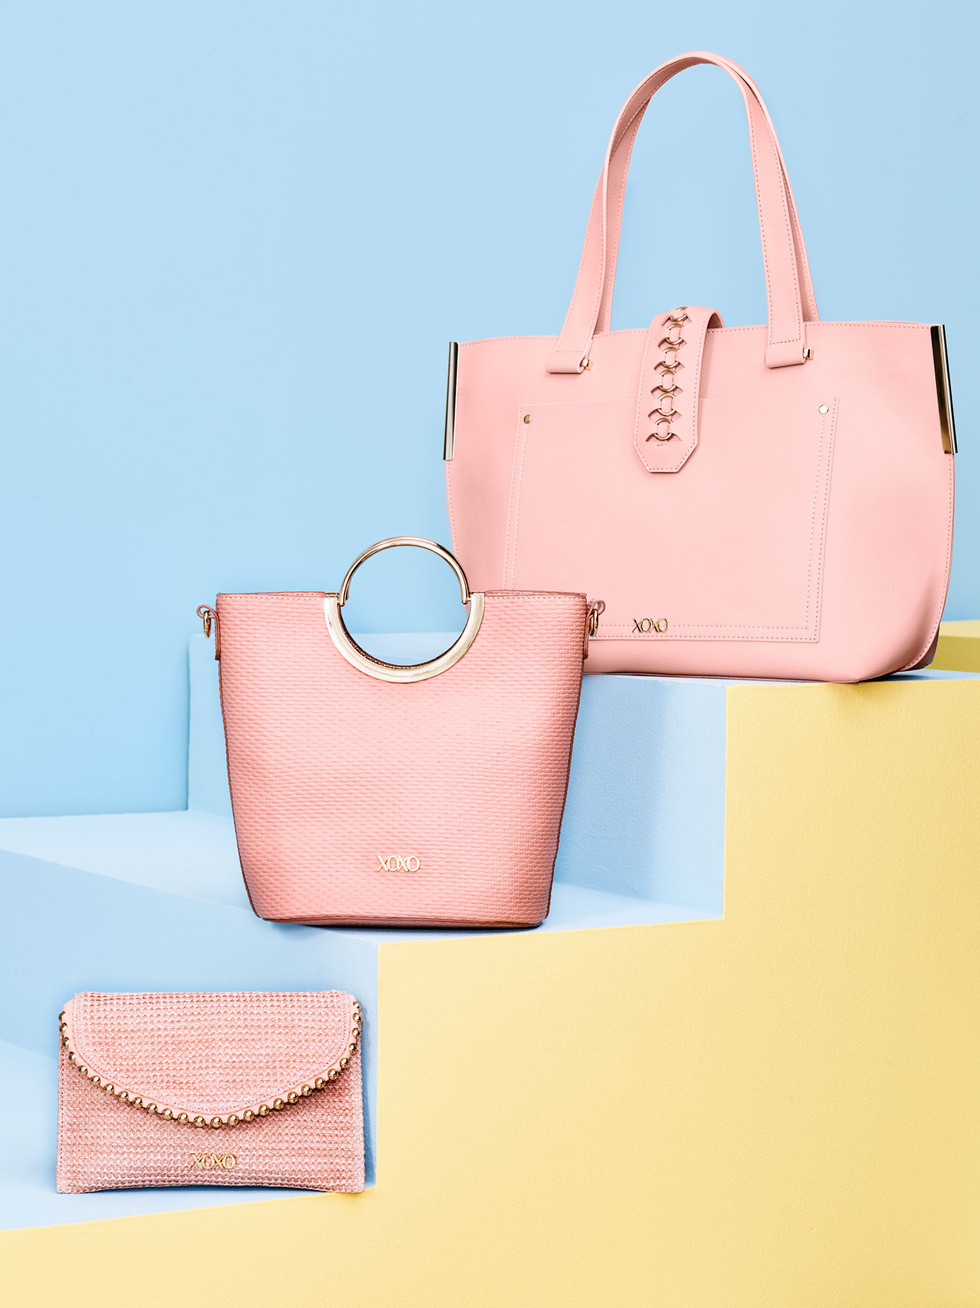 2018_12_11_XOXO_Spring2019_Handbag_01_00